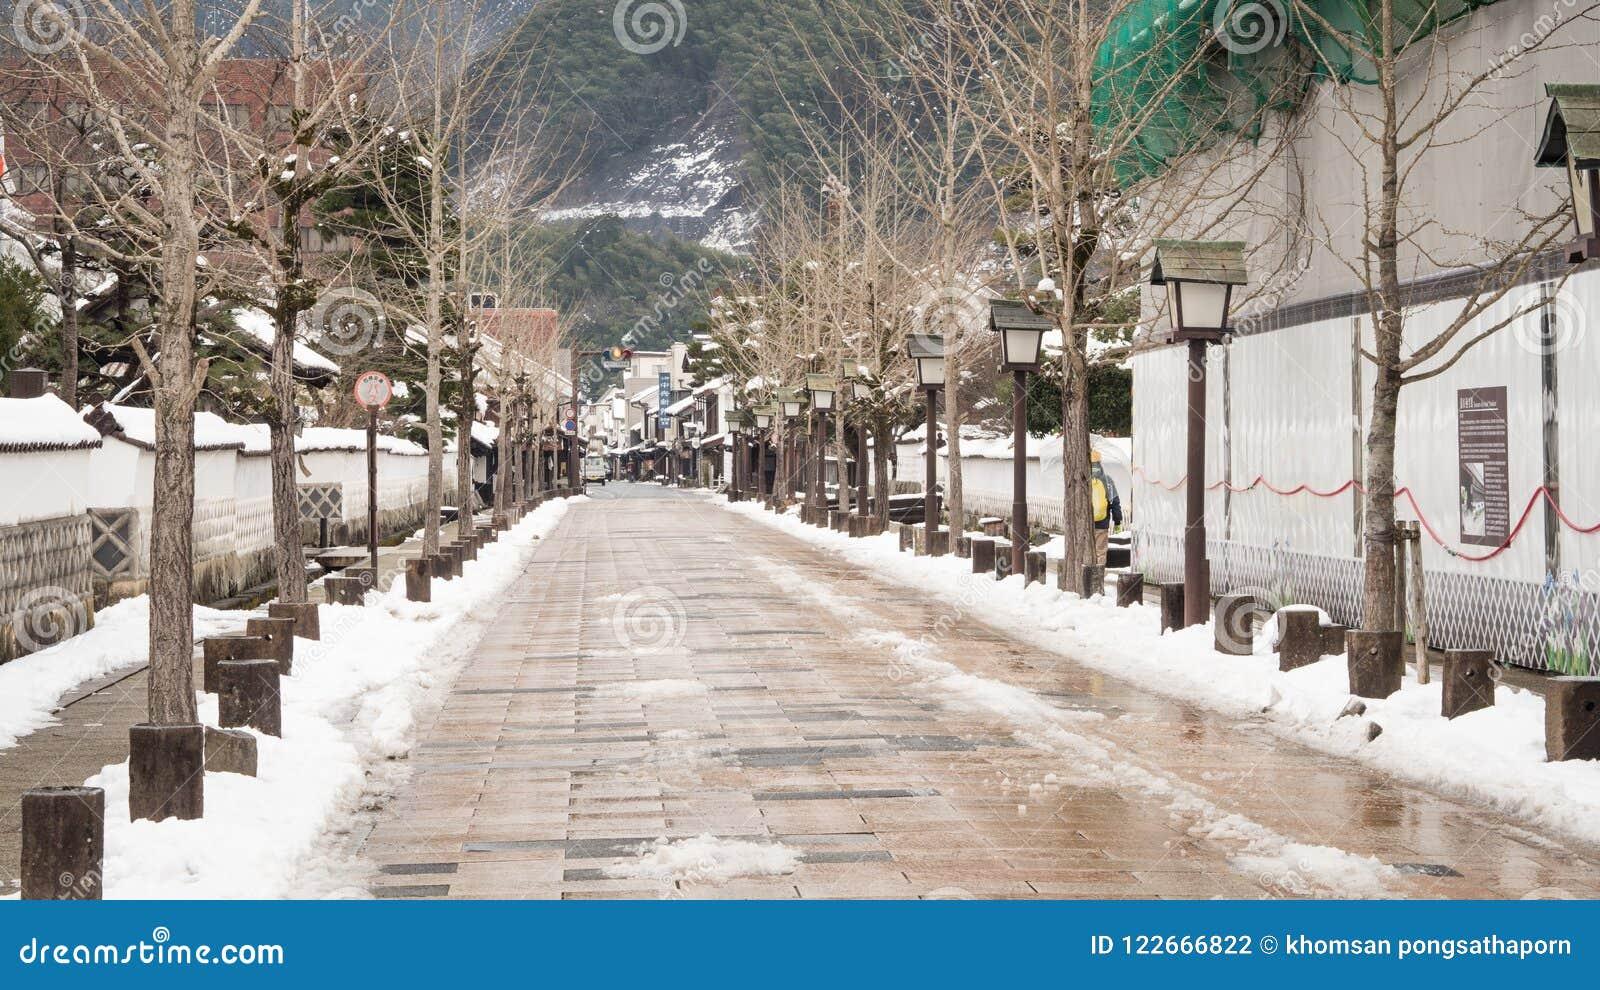 Na de sneeuw leven de Stadbewoners intern, makend de straten in stadstsuwano stil